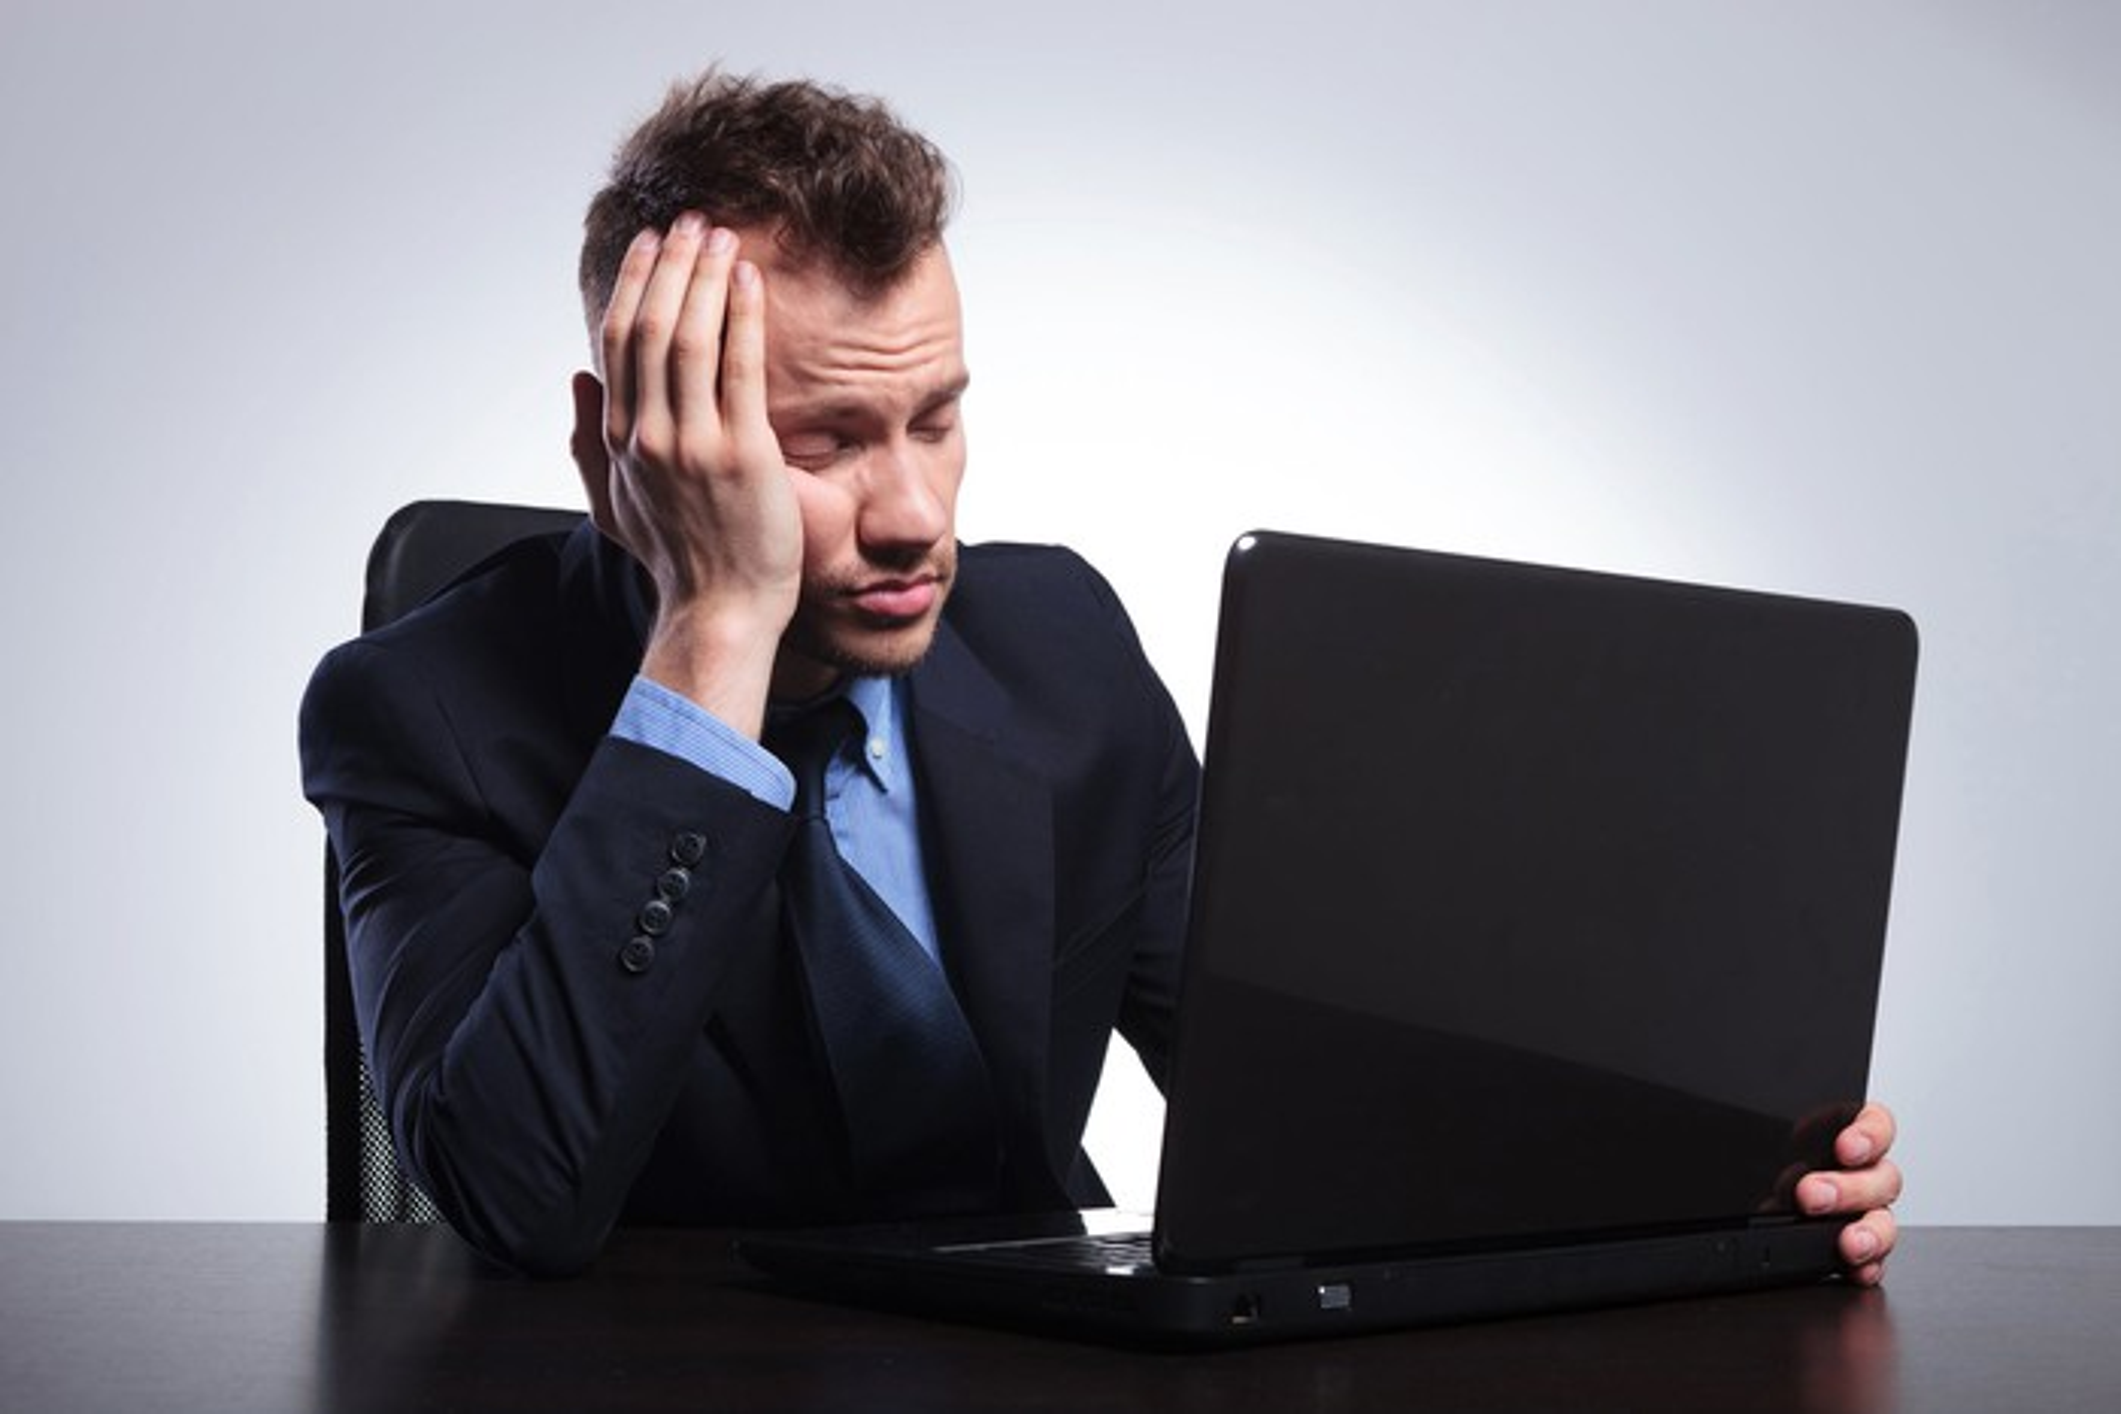 Seated man in suit falling asleep at laptop